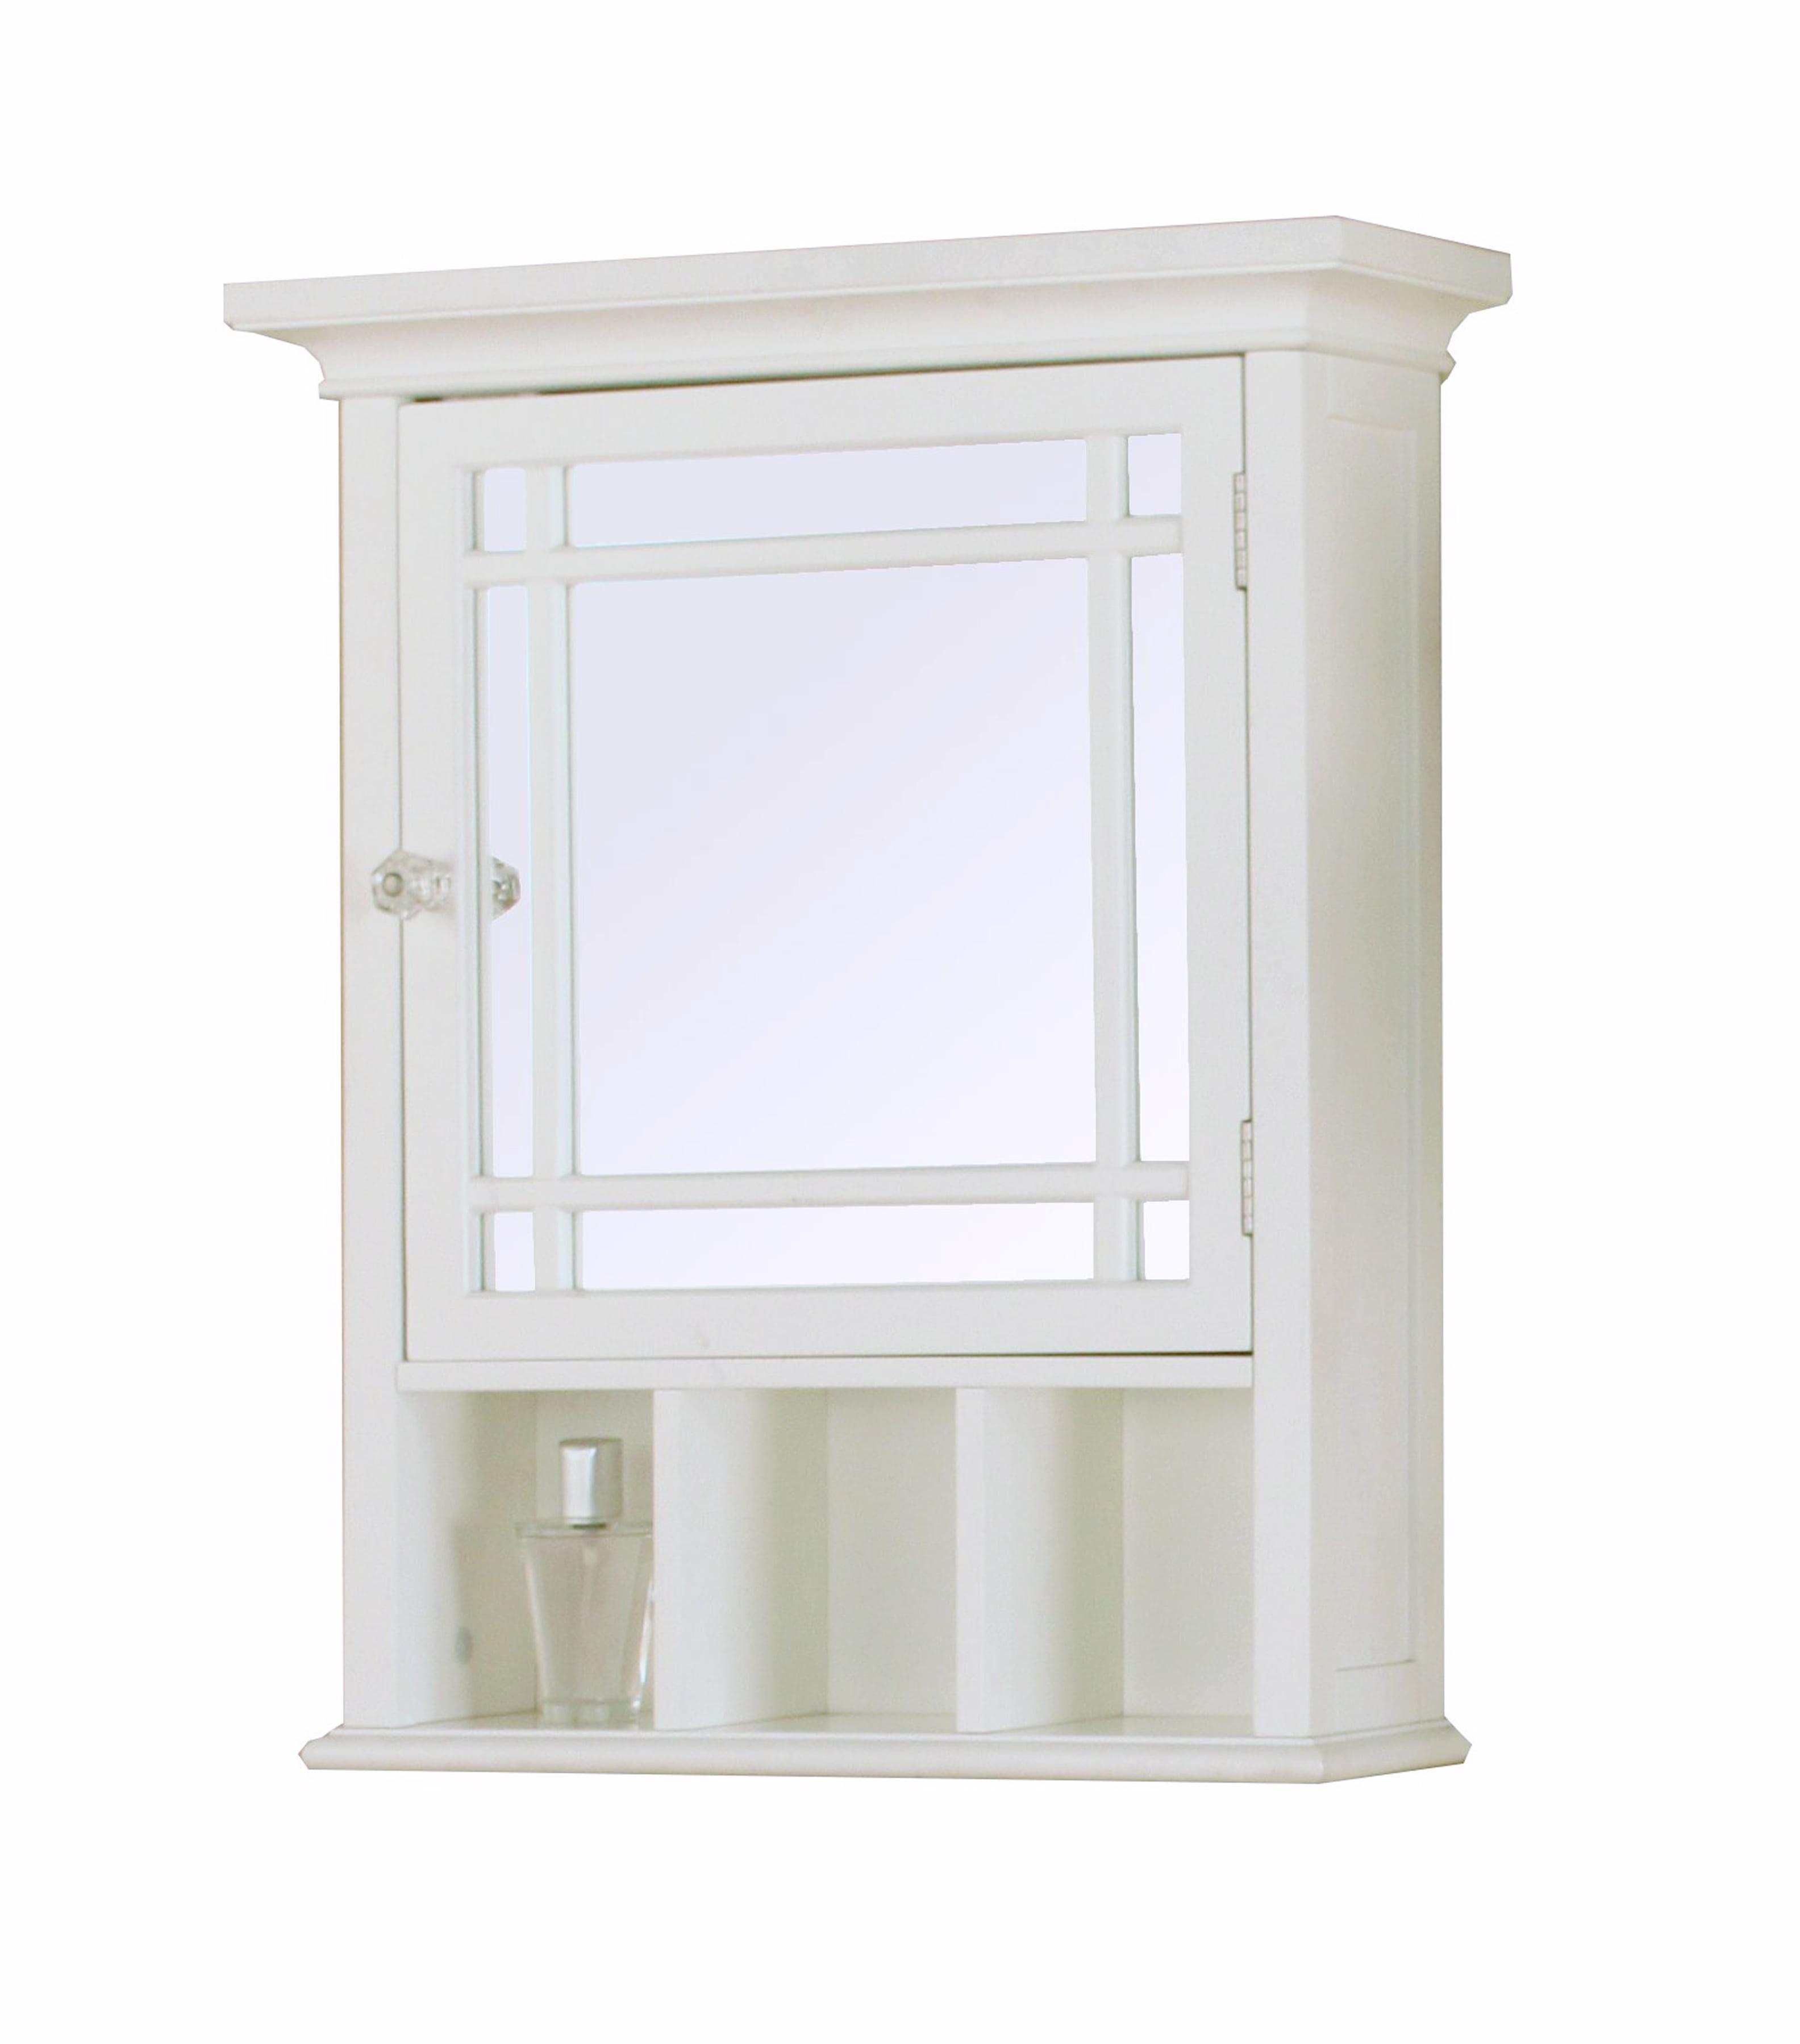 Heritage Medicine Cabinet, White - Walmart.com